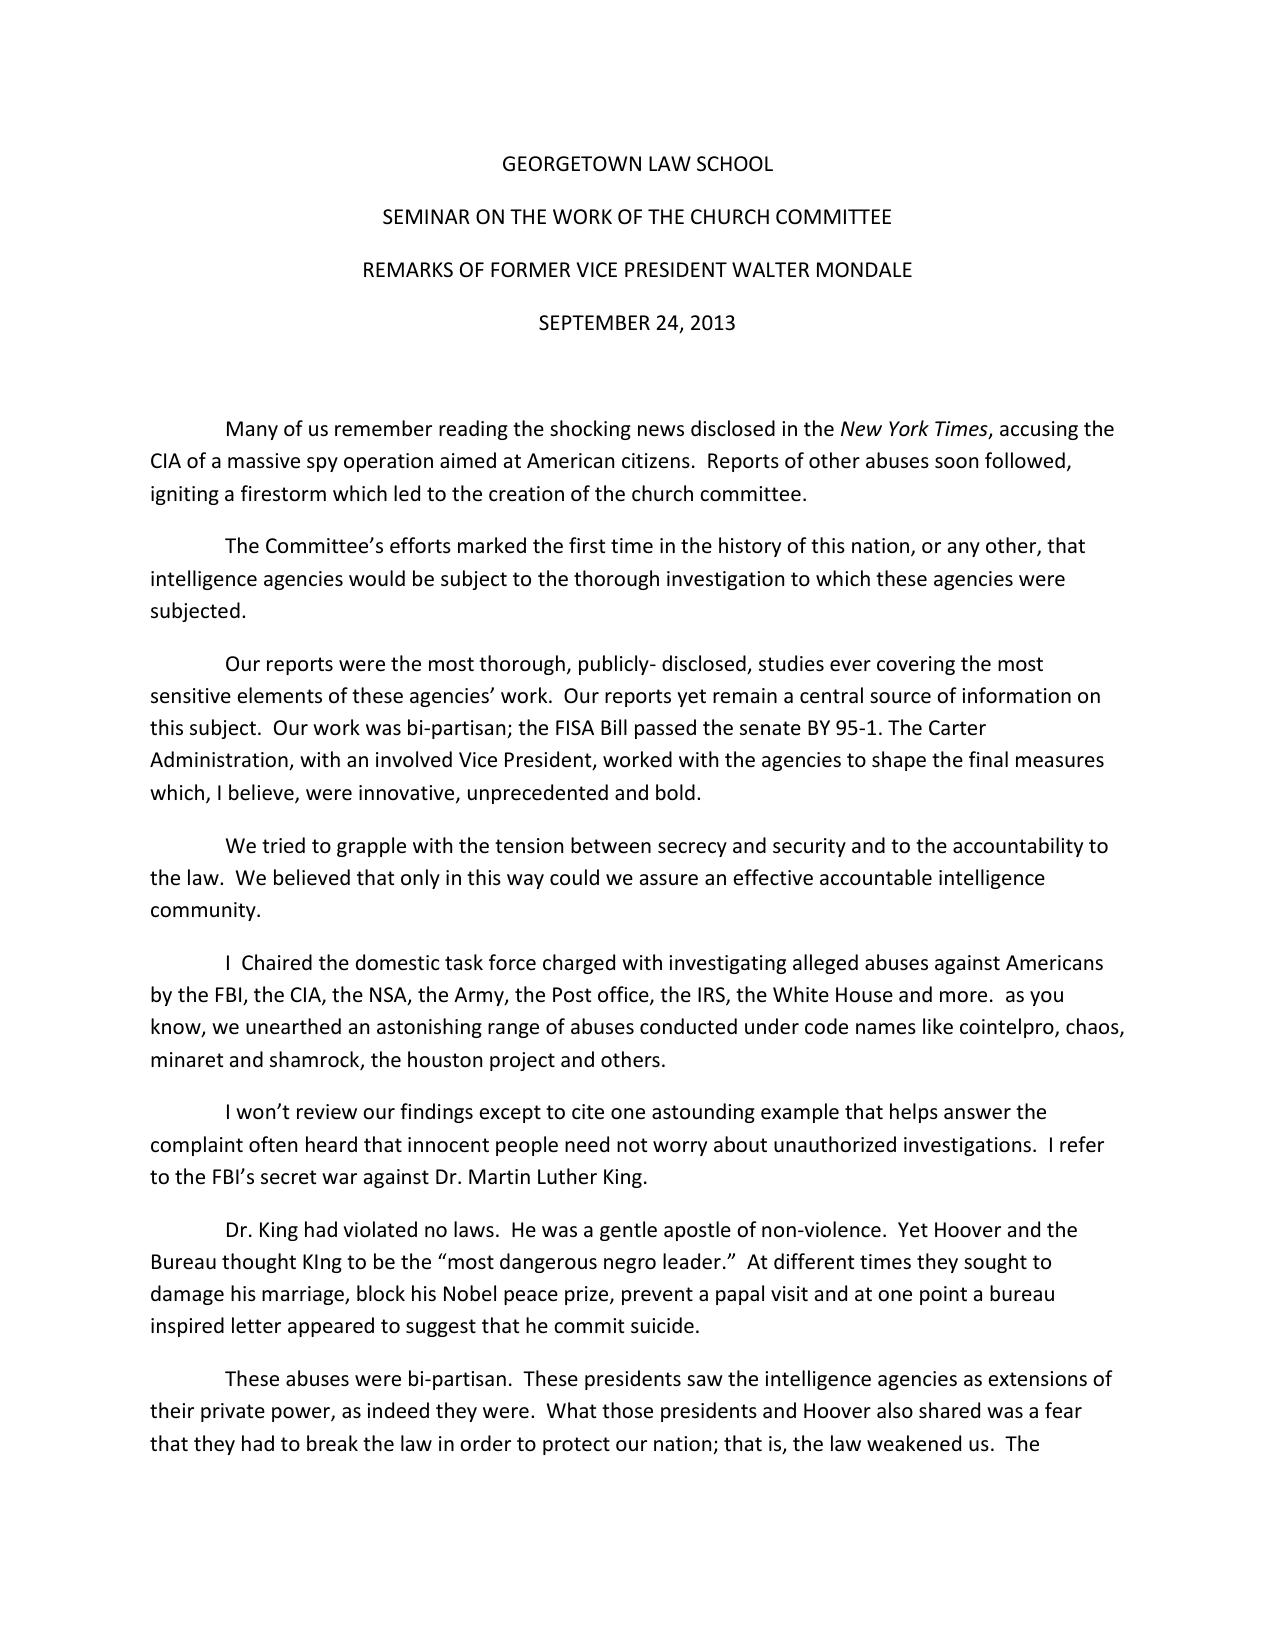 georgetown law cover letter - Ataum berglauf-verband com